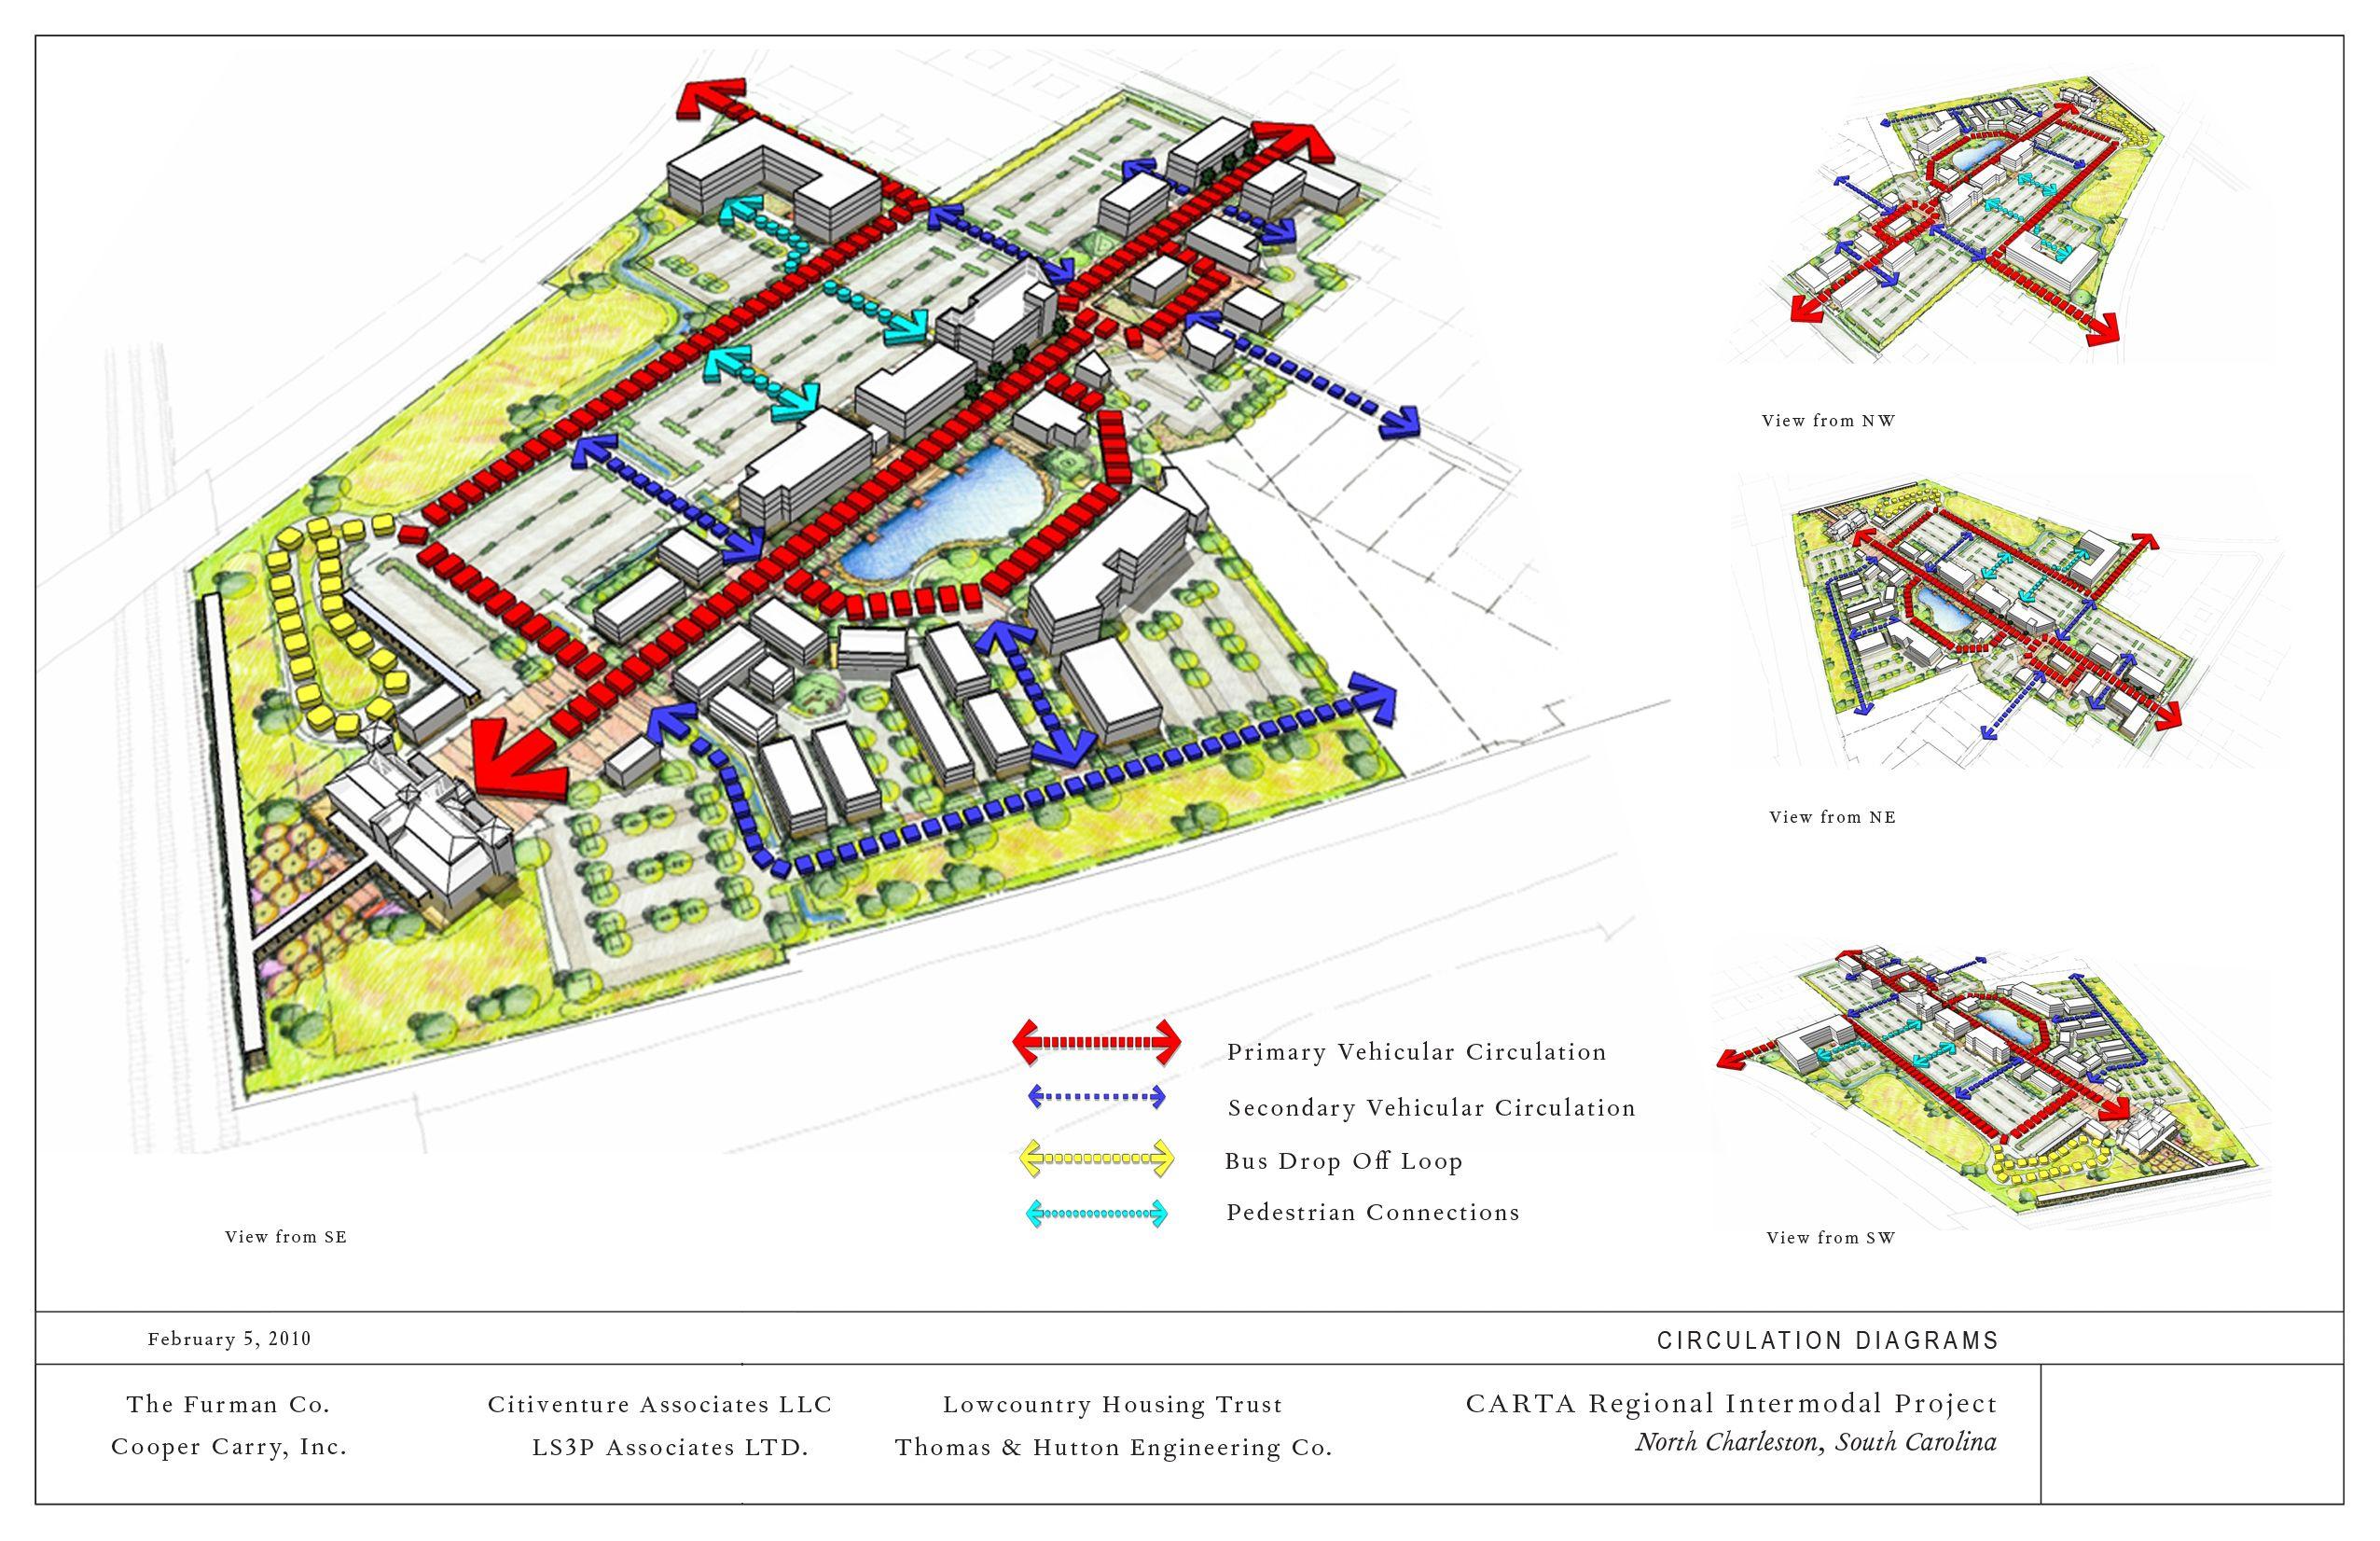 master plan architecture bubble diagram bmw e60 pdc wiring architectural 3d diagrams | circulation on 11x17 border landscape pinterest ...